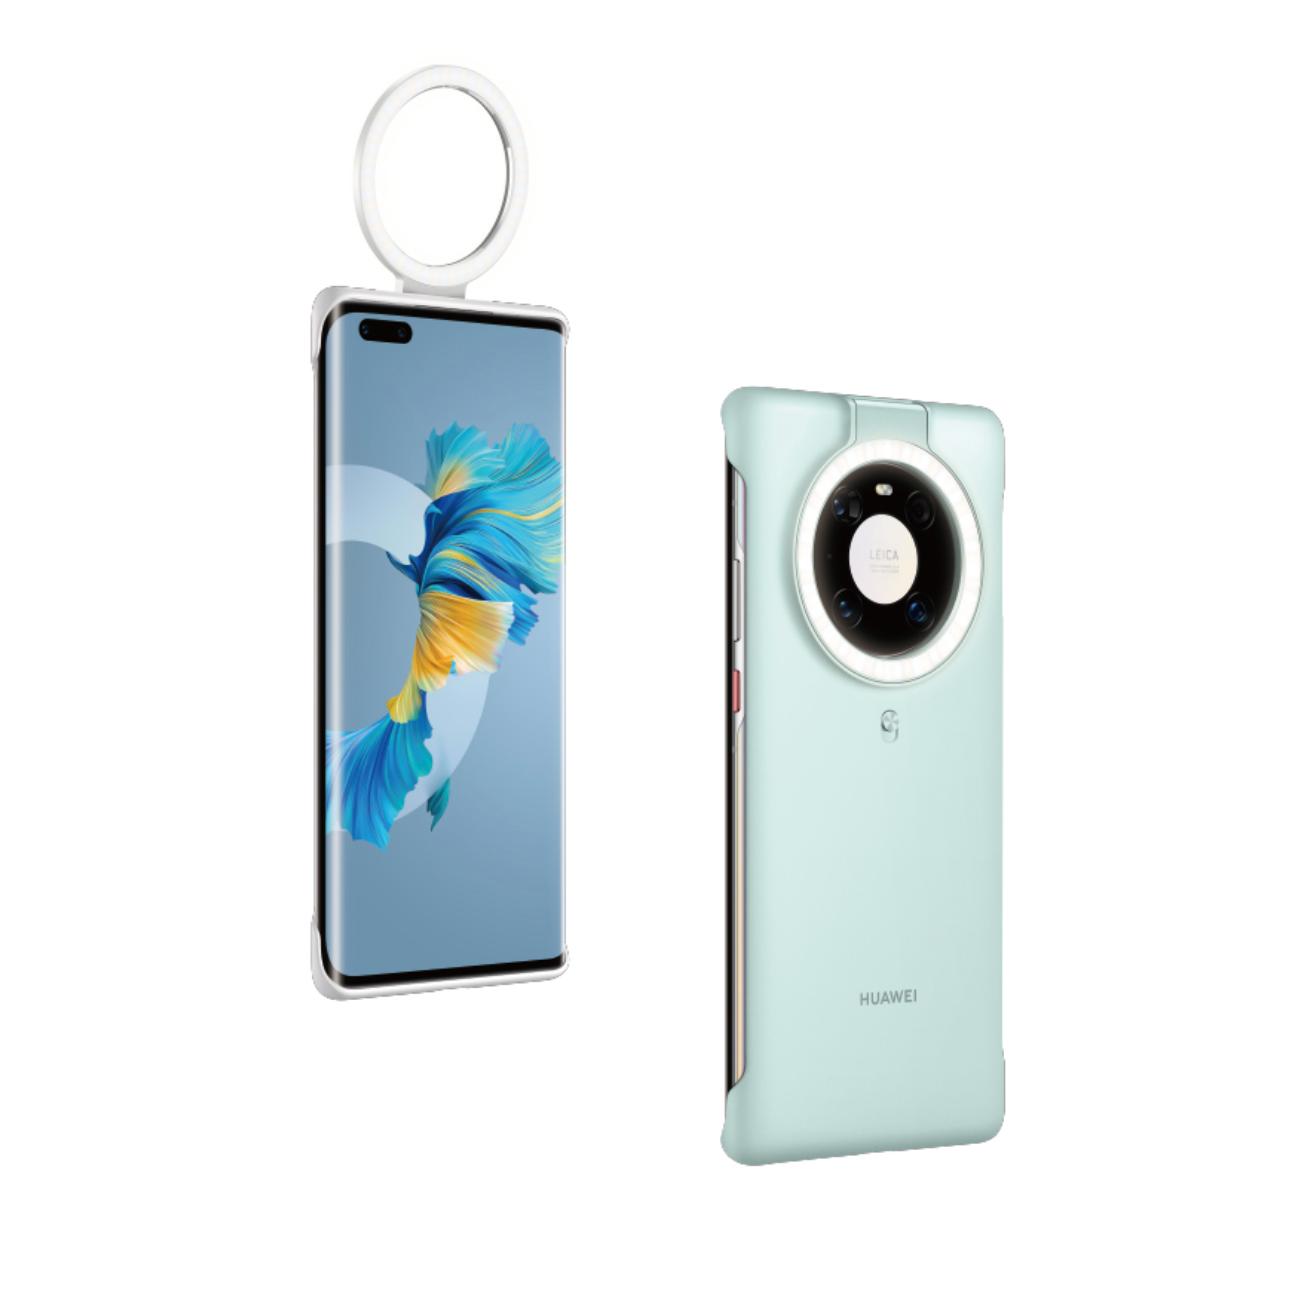 HUAWEI 华为 Mate 40 Pro 塑料手机壳 知更蓝